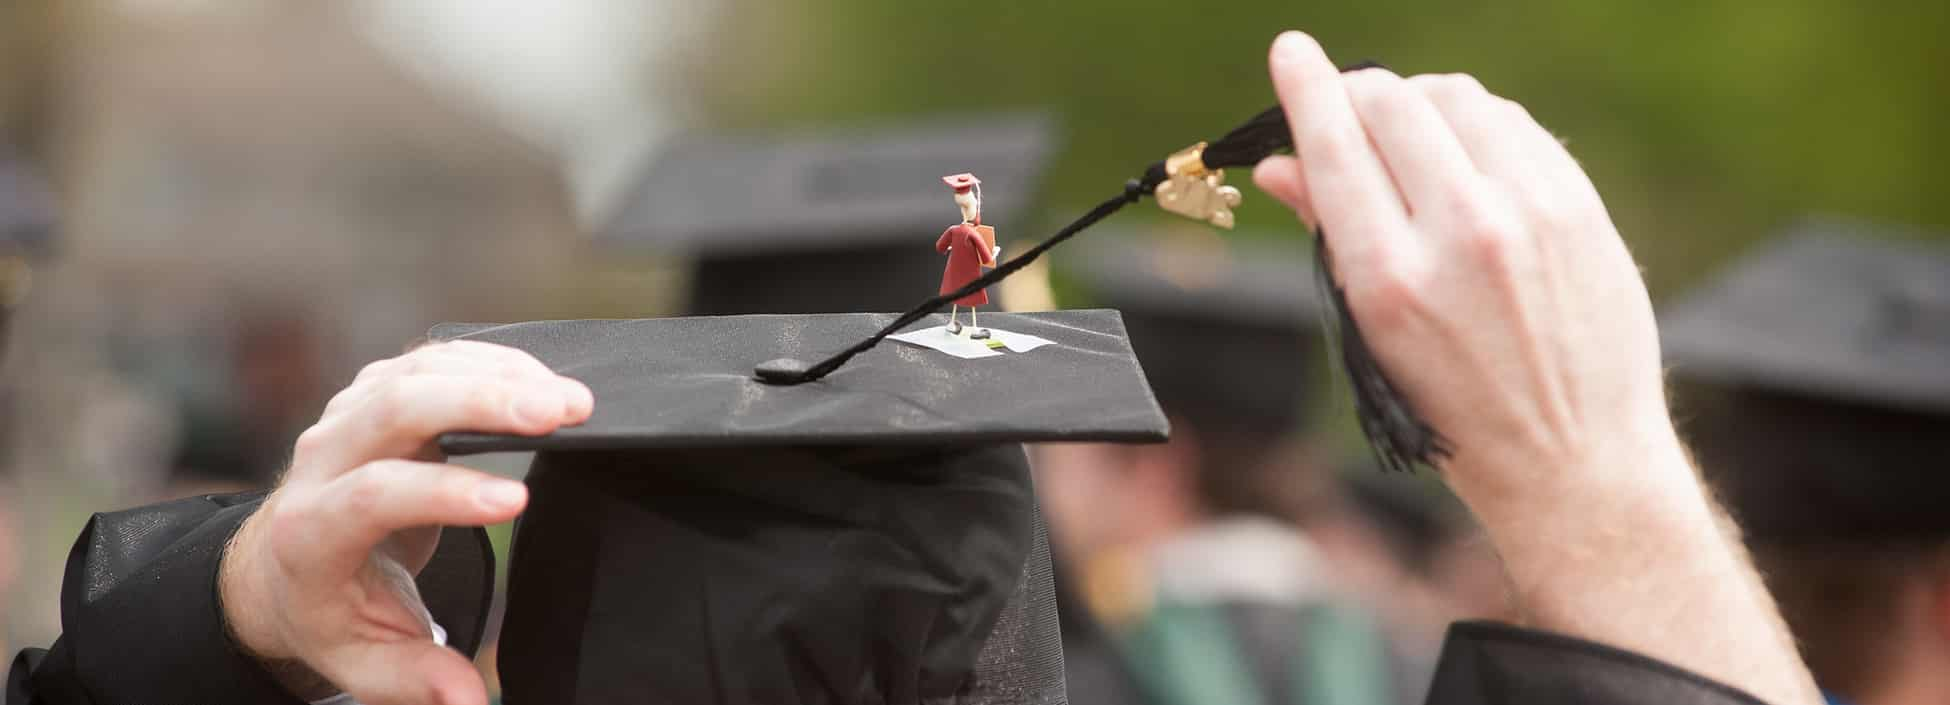 commencement, graduation, mortarboard, fun